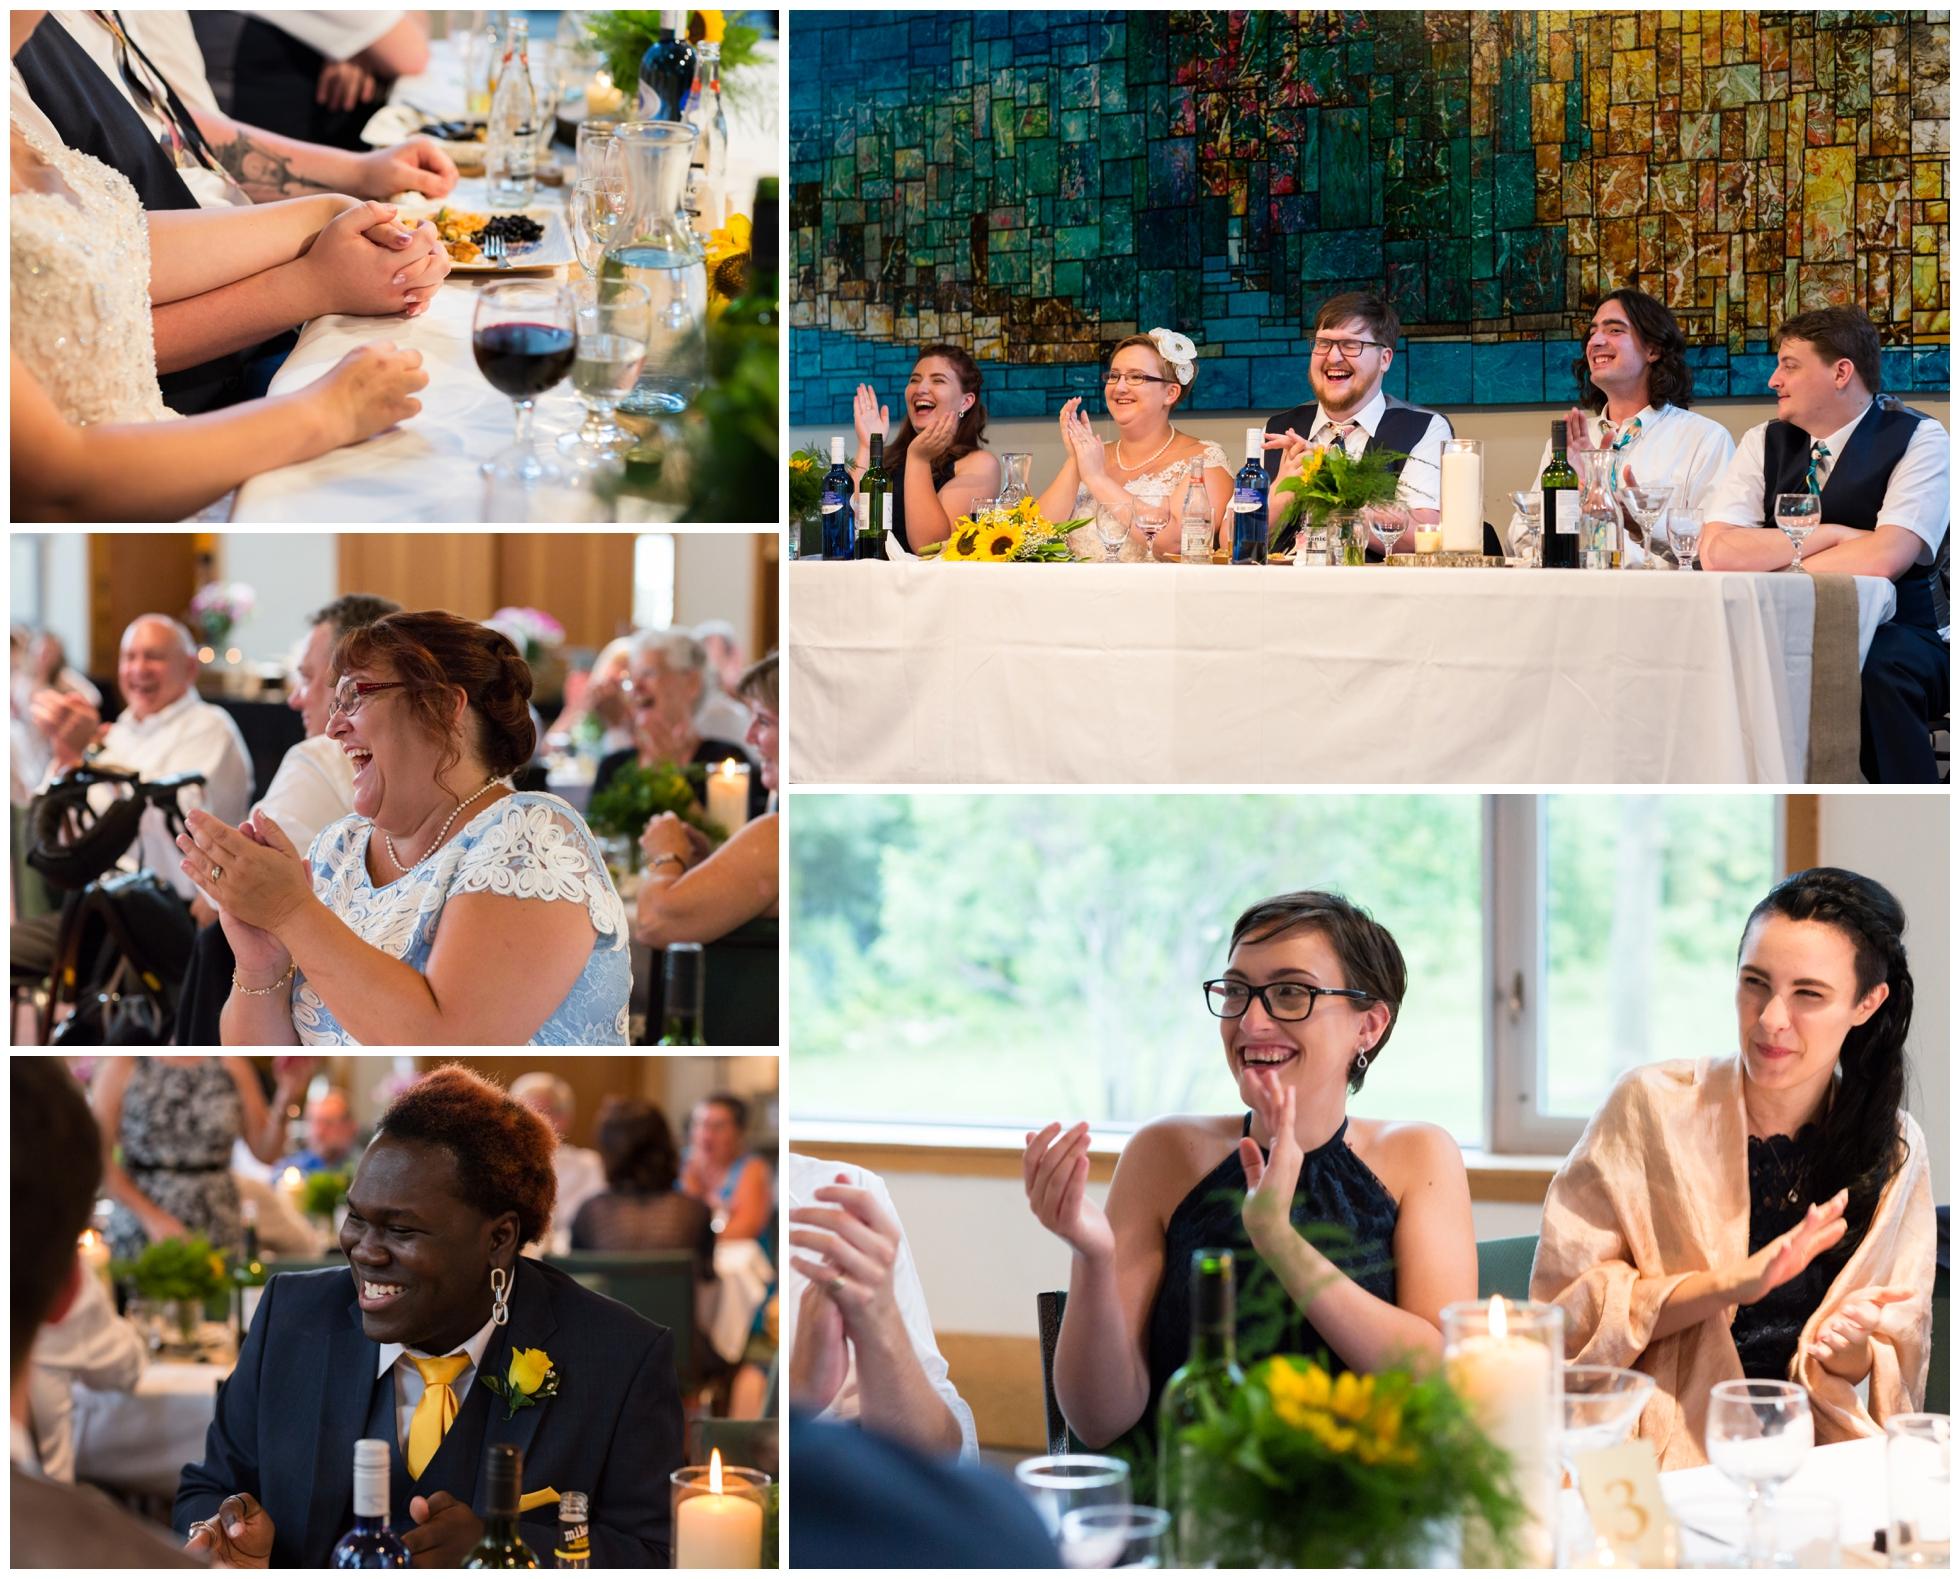 Toronto Wedding Chris Kate (Selena Phillips-Boyle)_0032.jpg